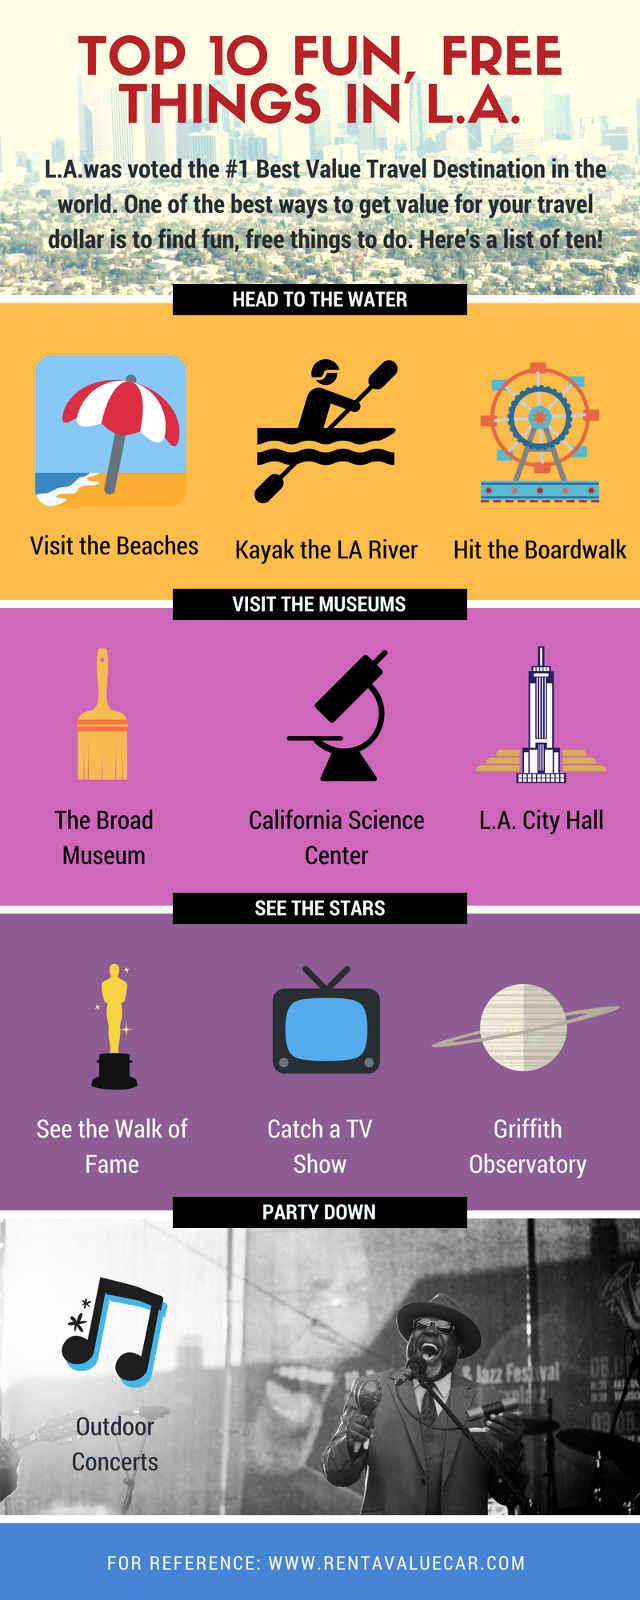 Top 10 Free Things In LA rentavaluecar.com